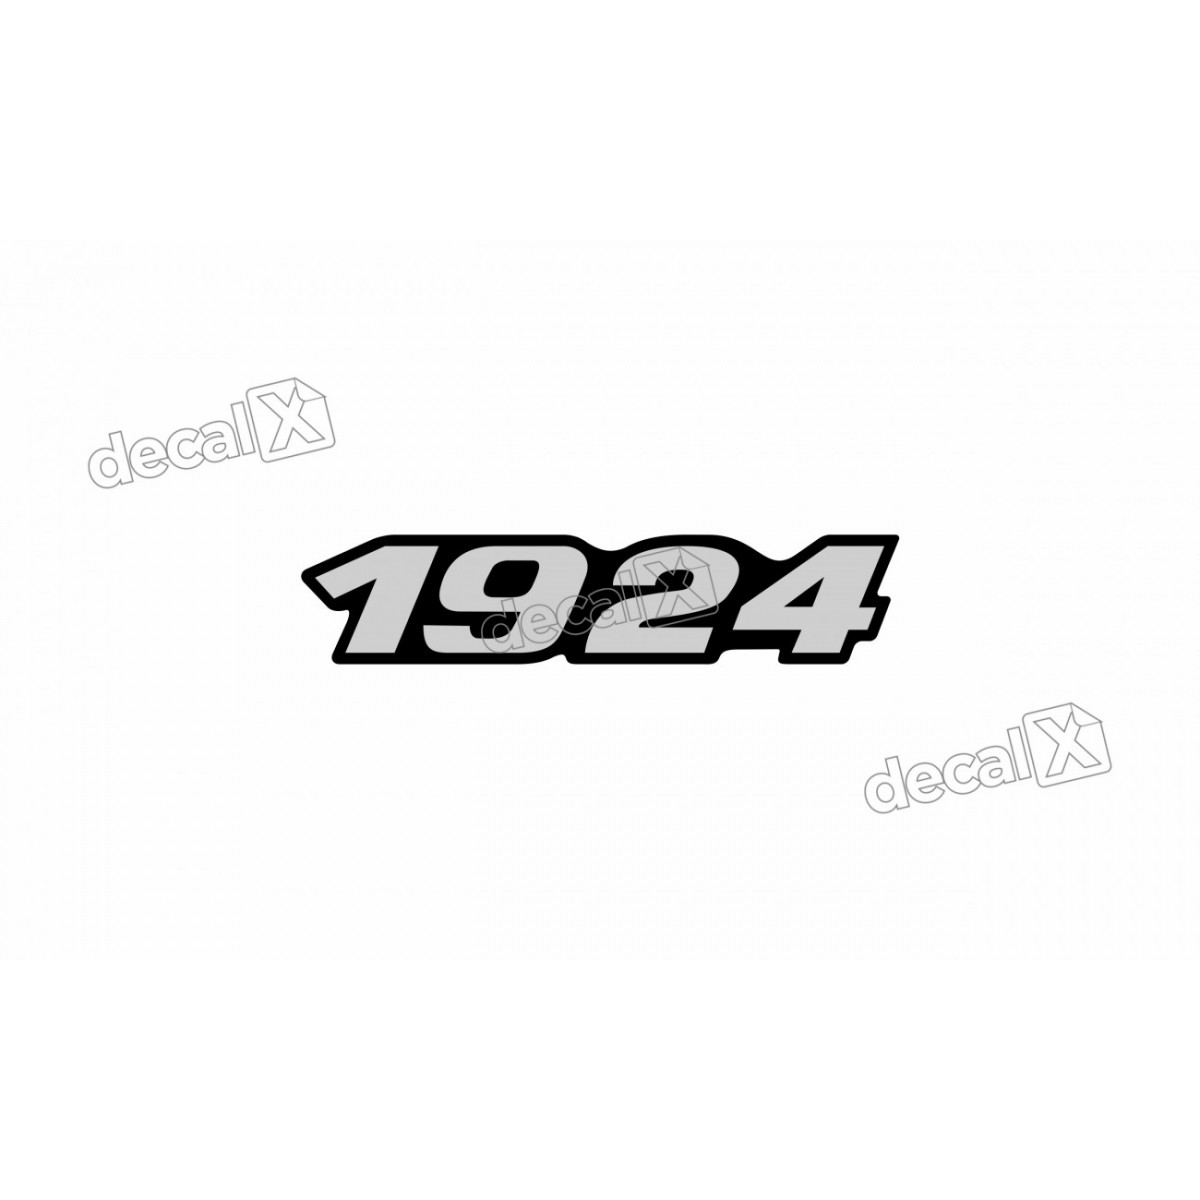 Adesivo Emblema Resinado Mercedes 1924 Cm65 Decalx